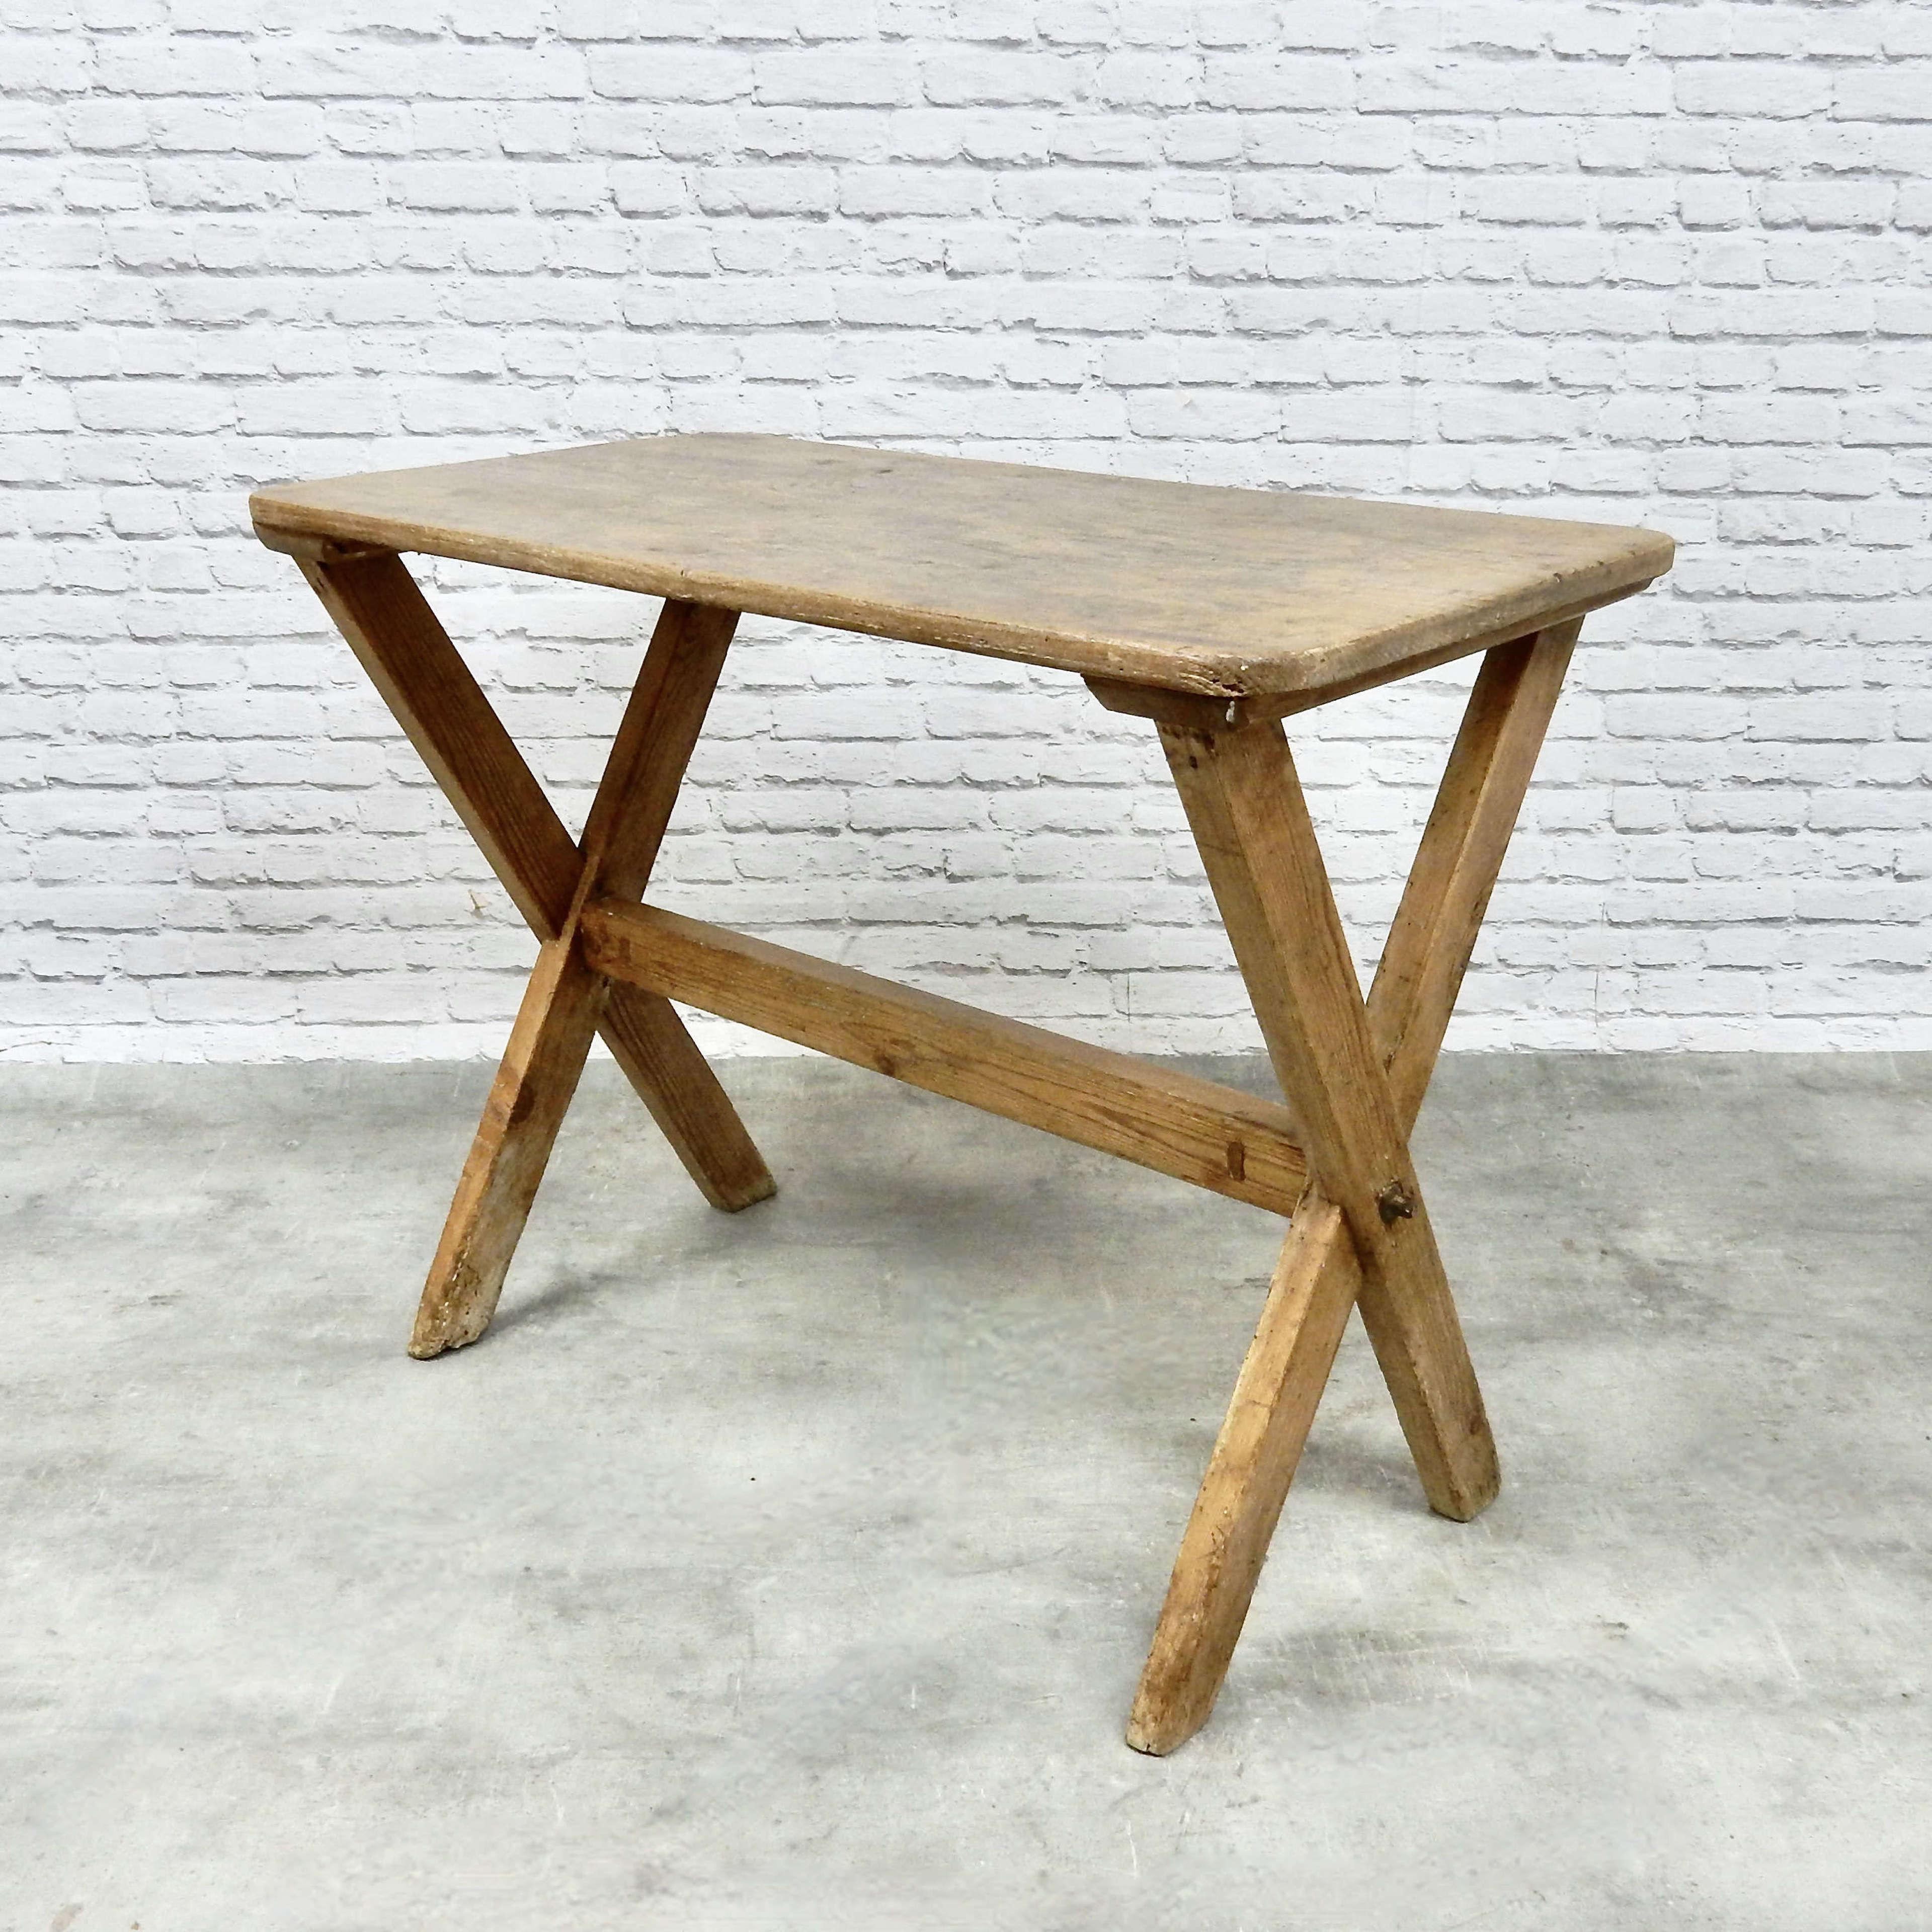 X-frame Tavern Table